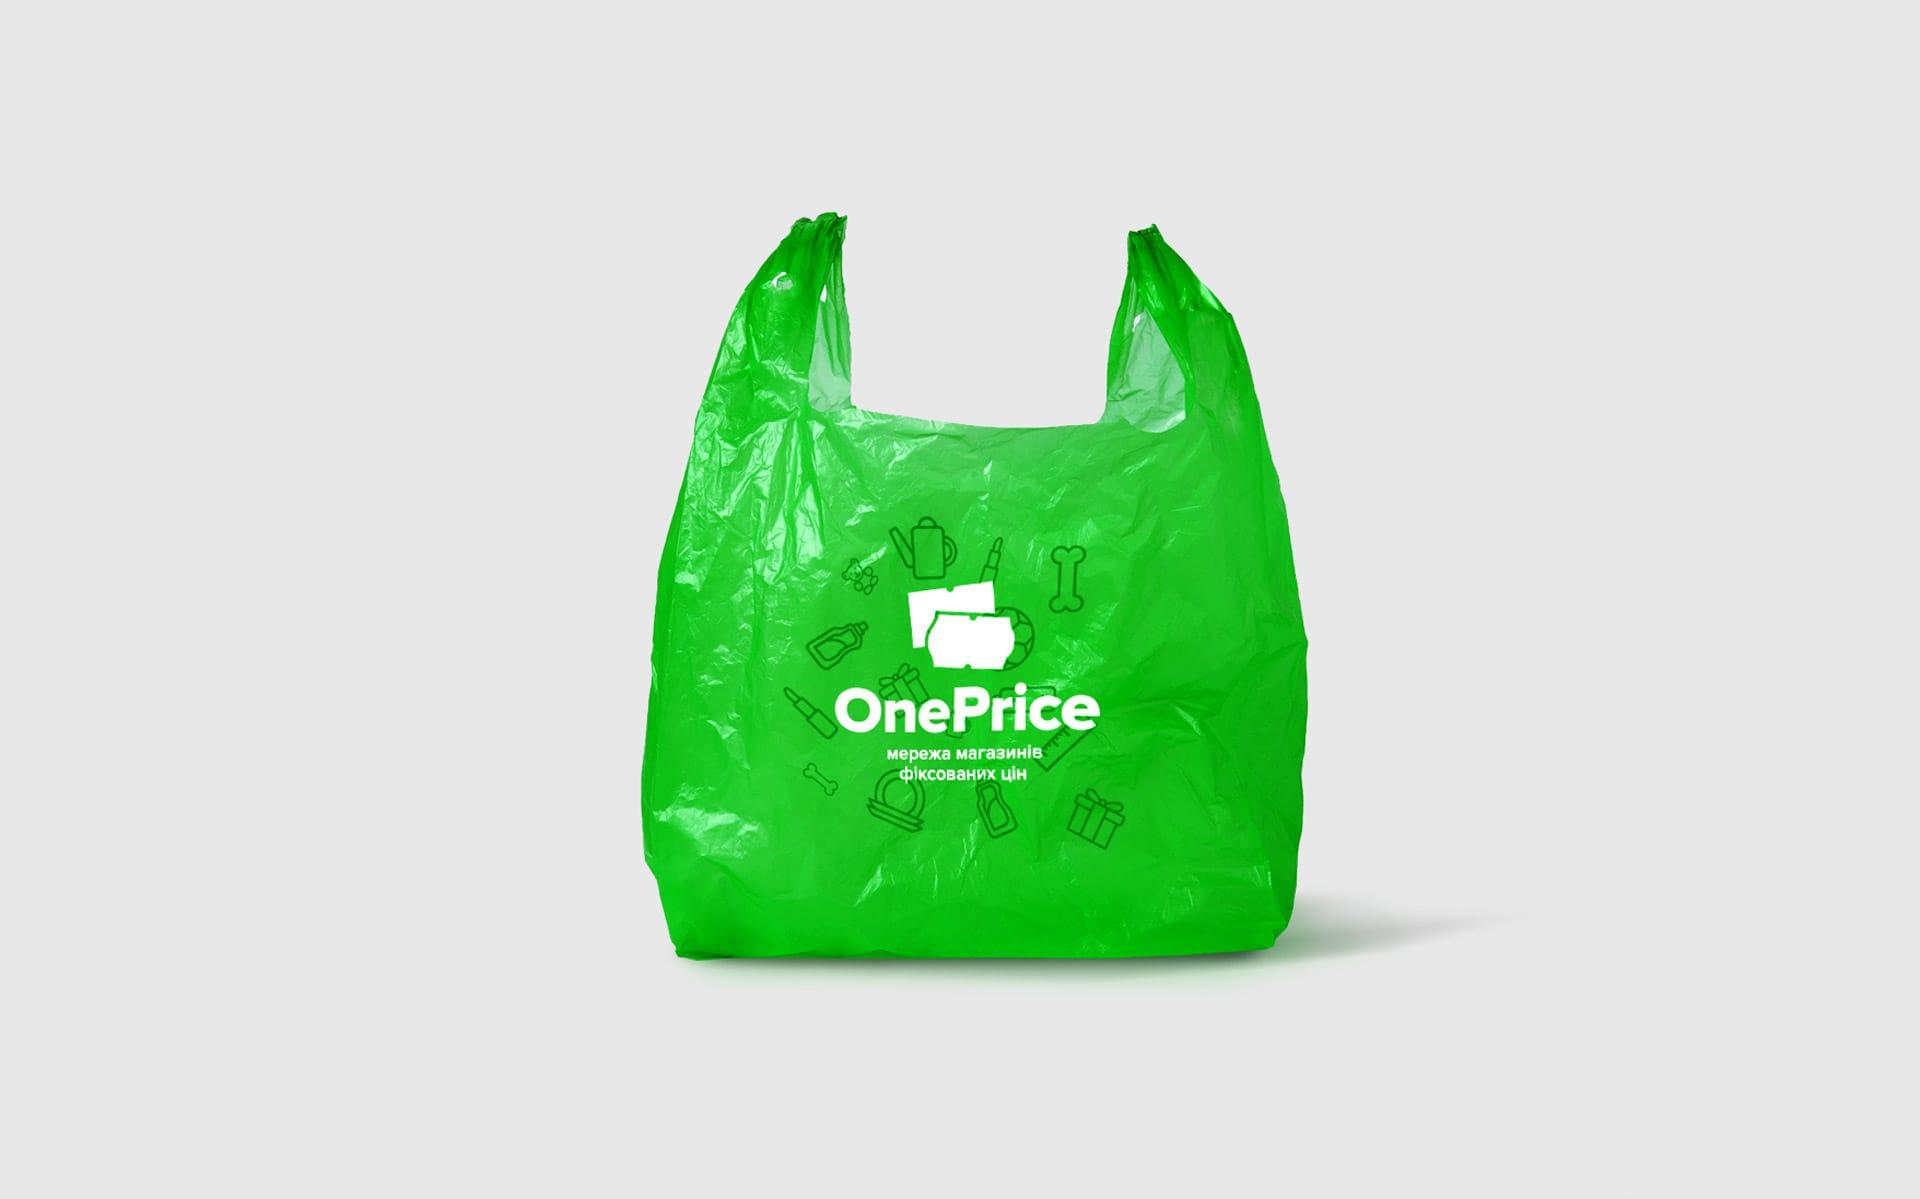 gra brand design oneprice 6